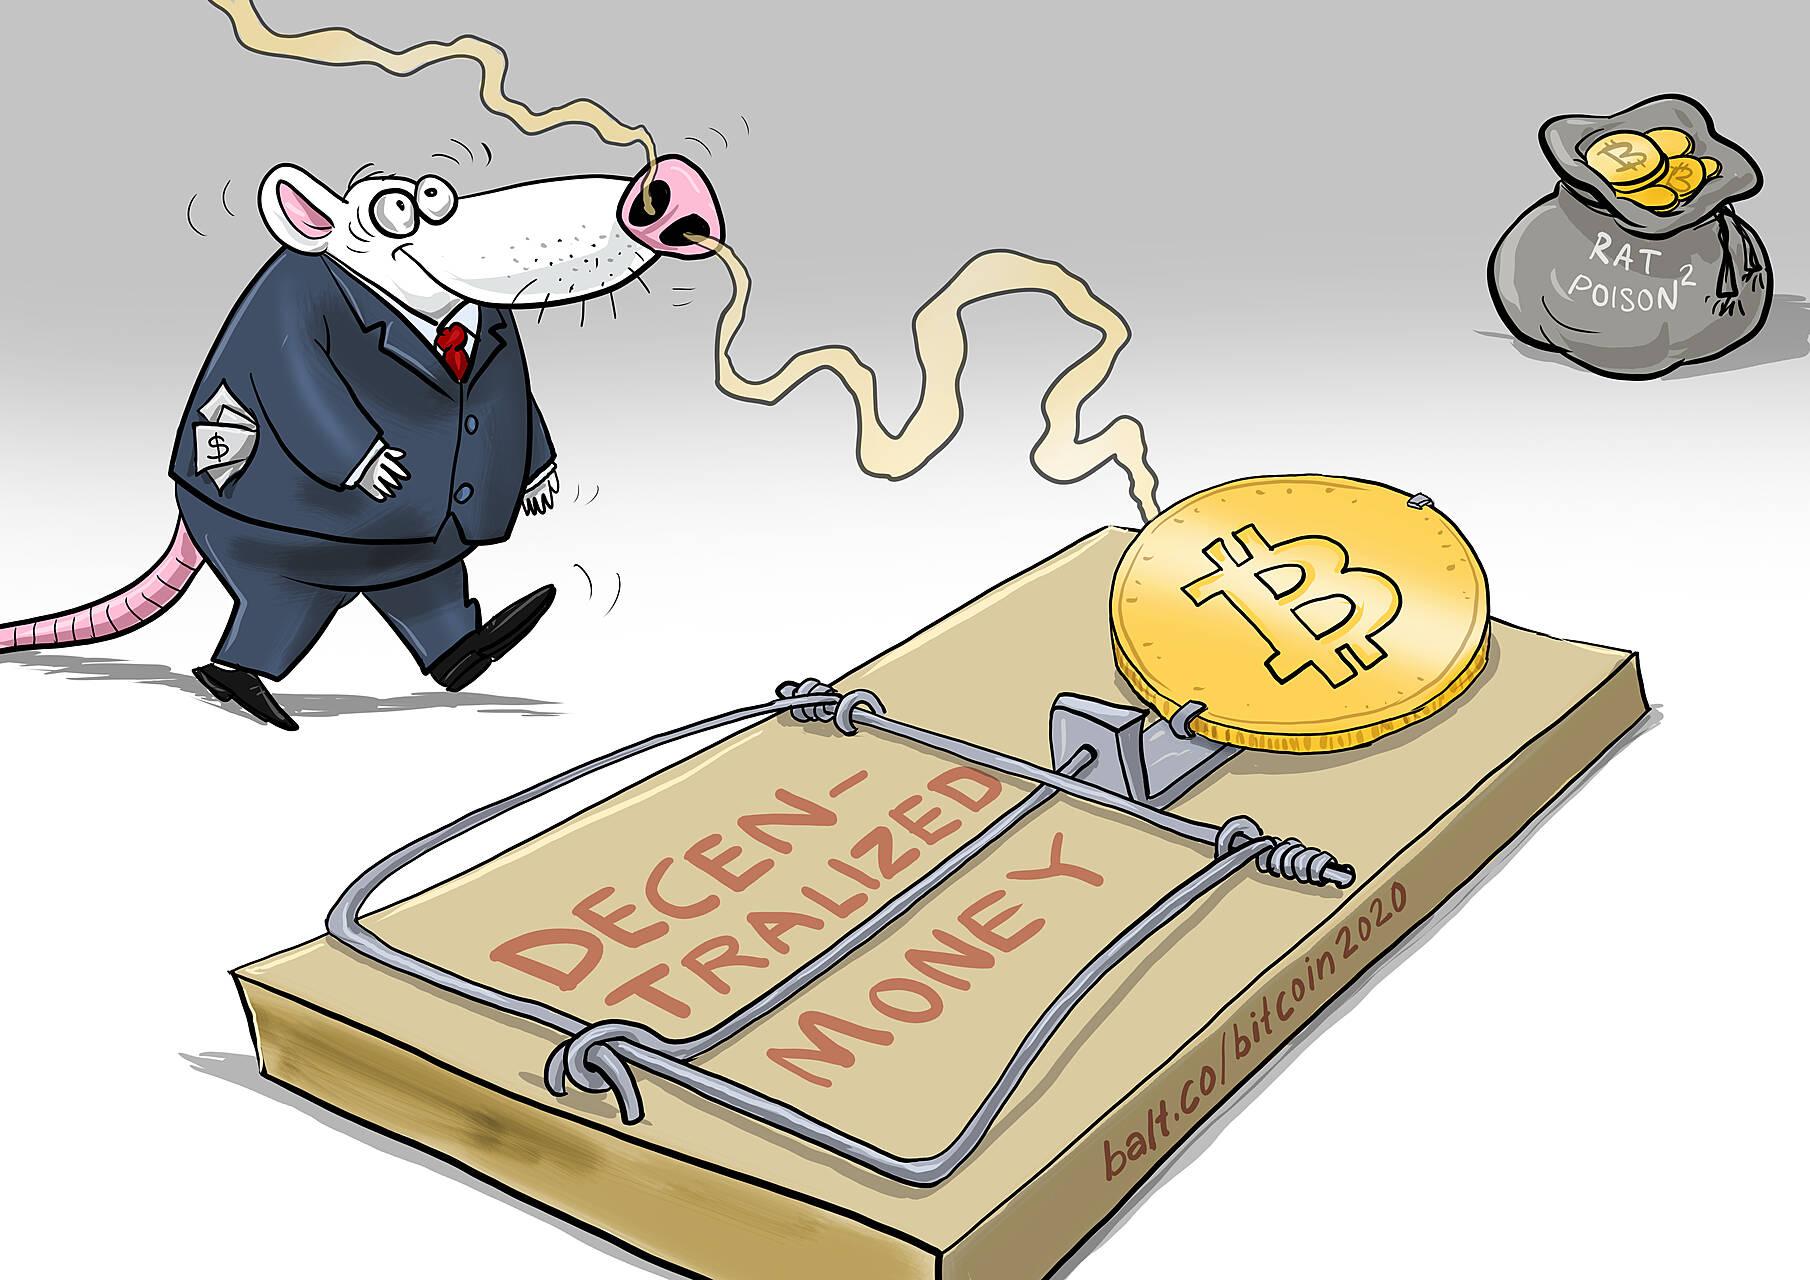 rat-poison-squared-cartoon.jpg